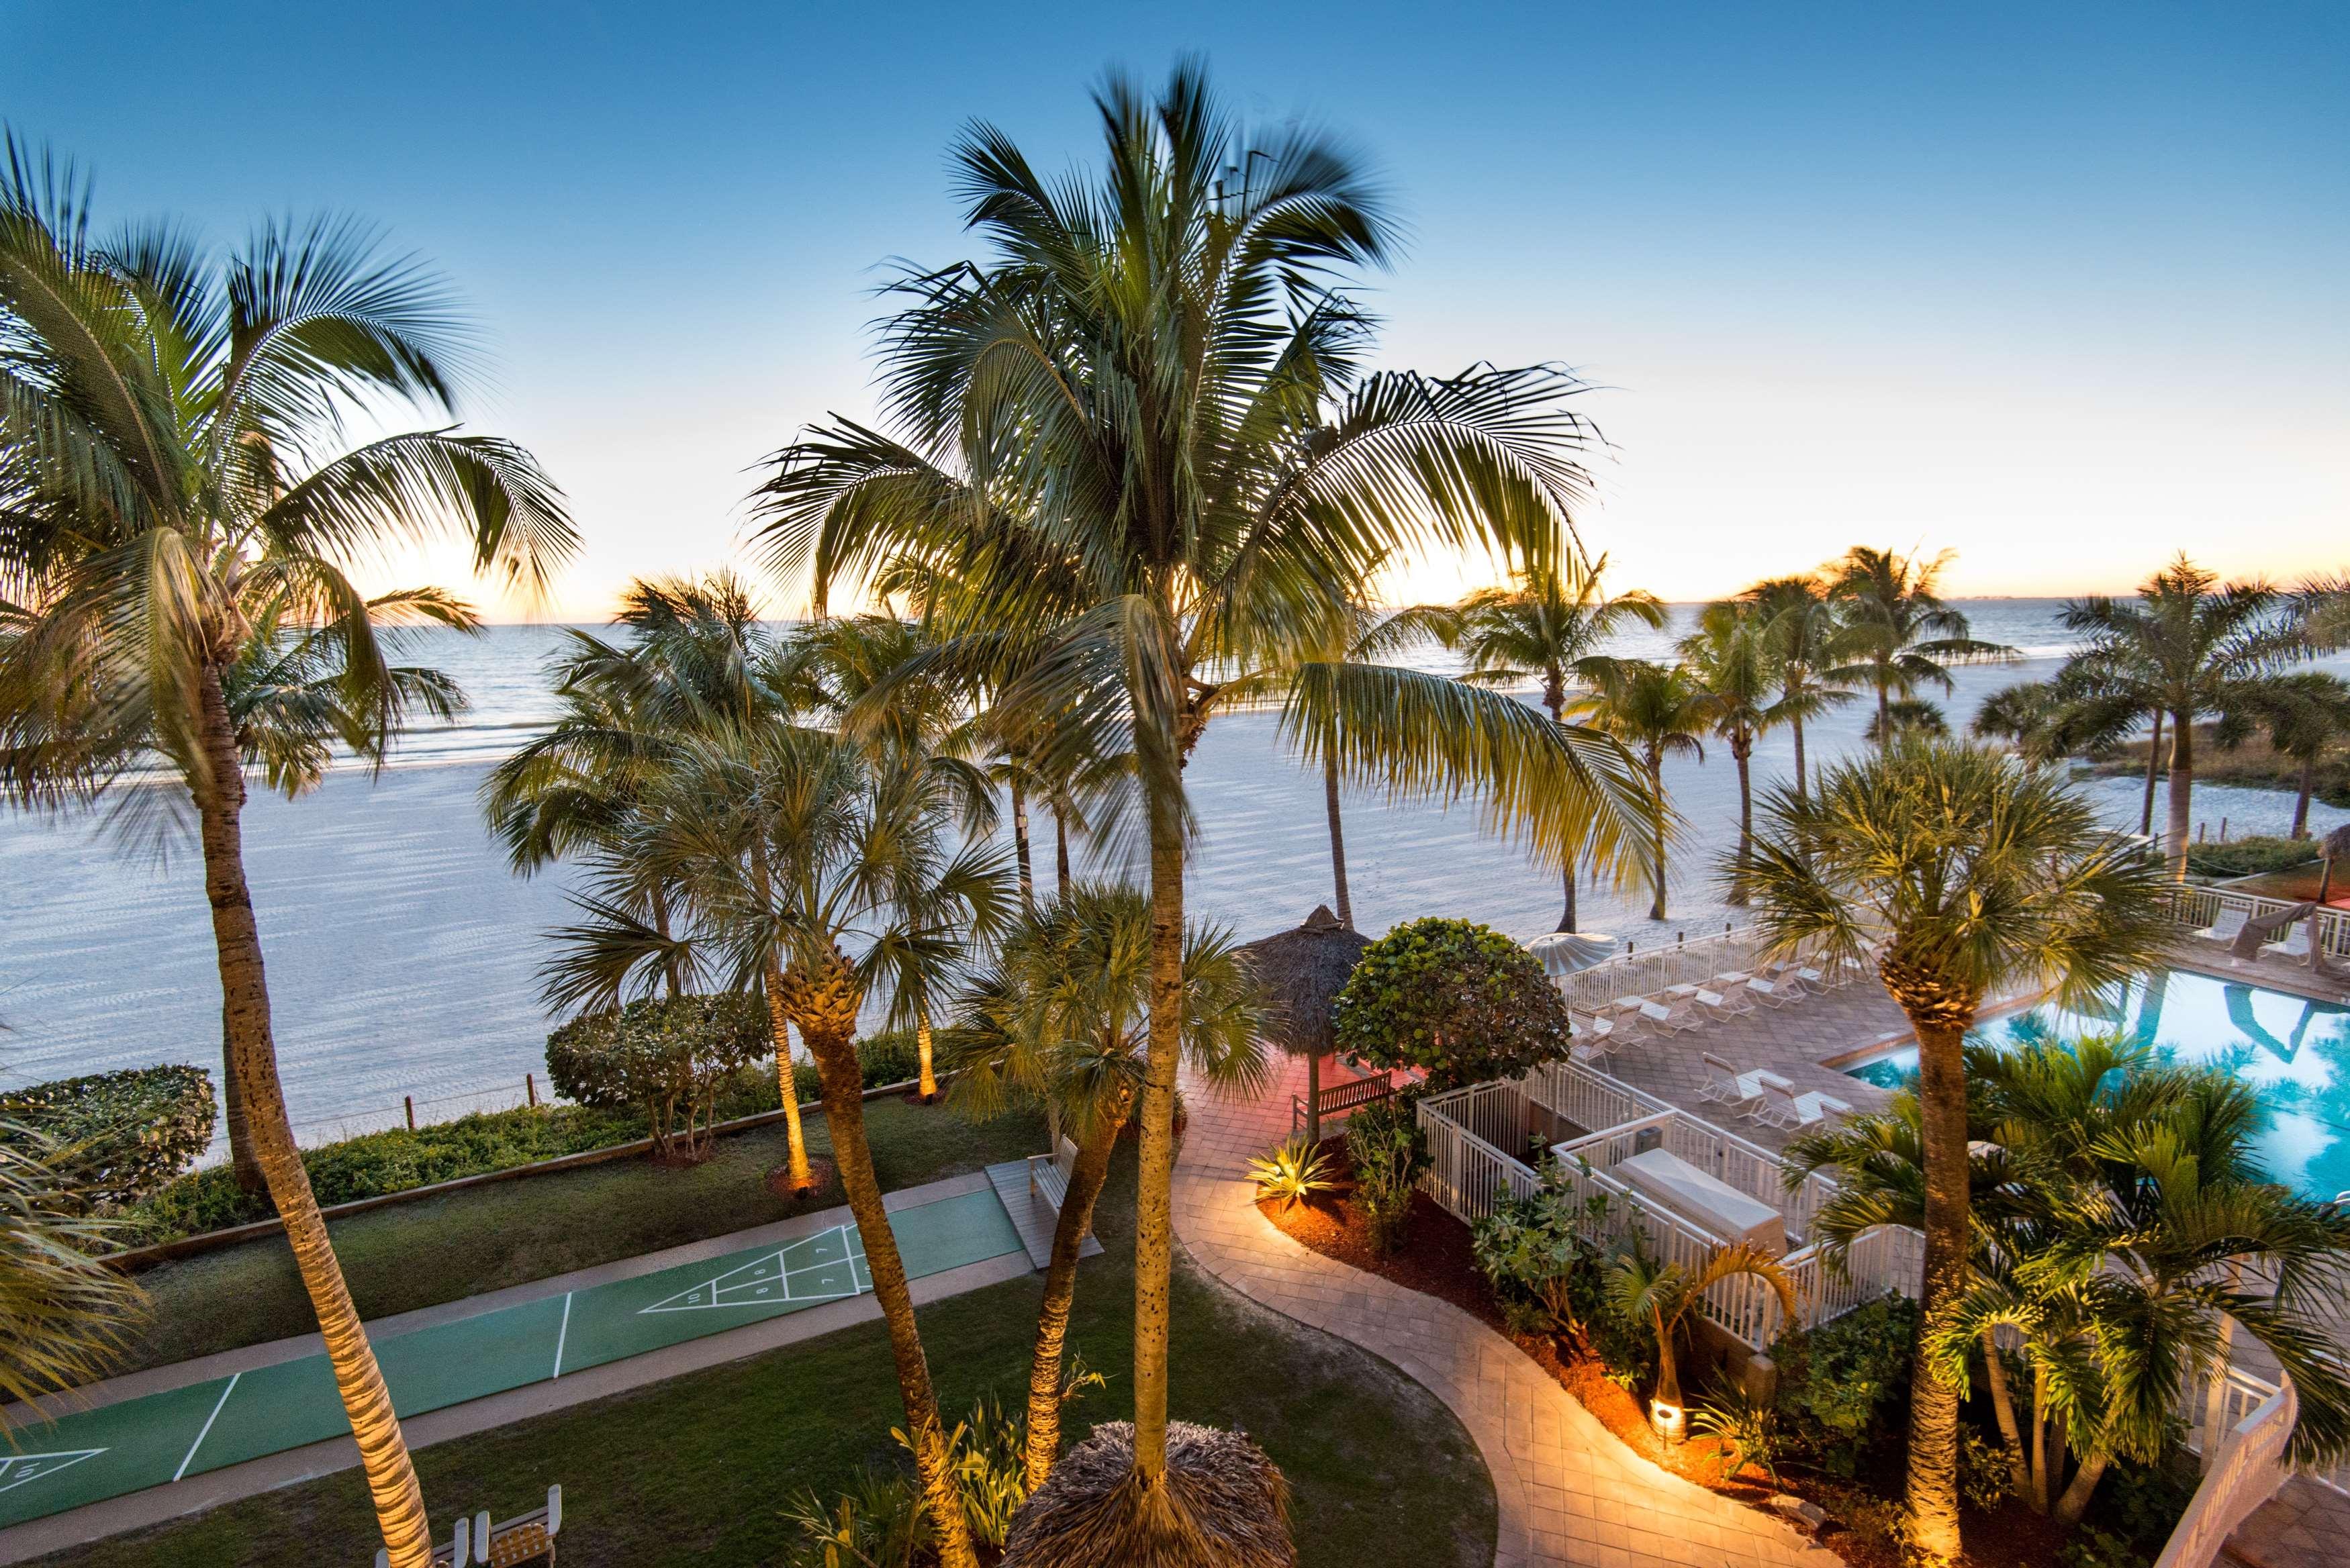 Best Western Plus Beach Resort Coupons near me in Fort